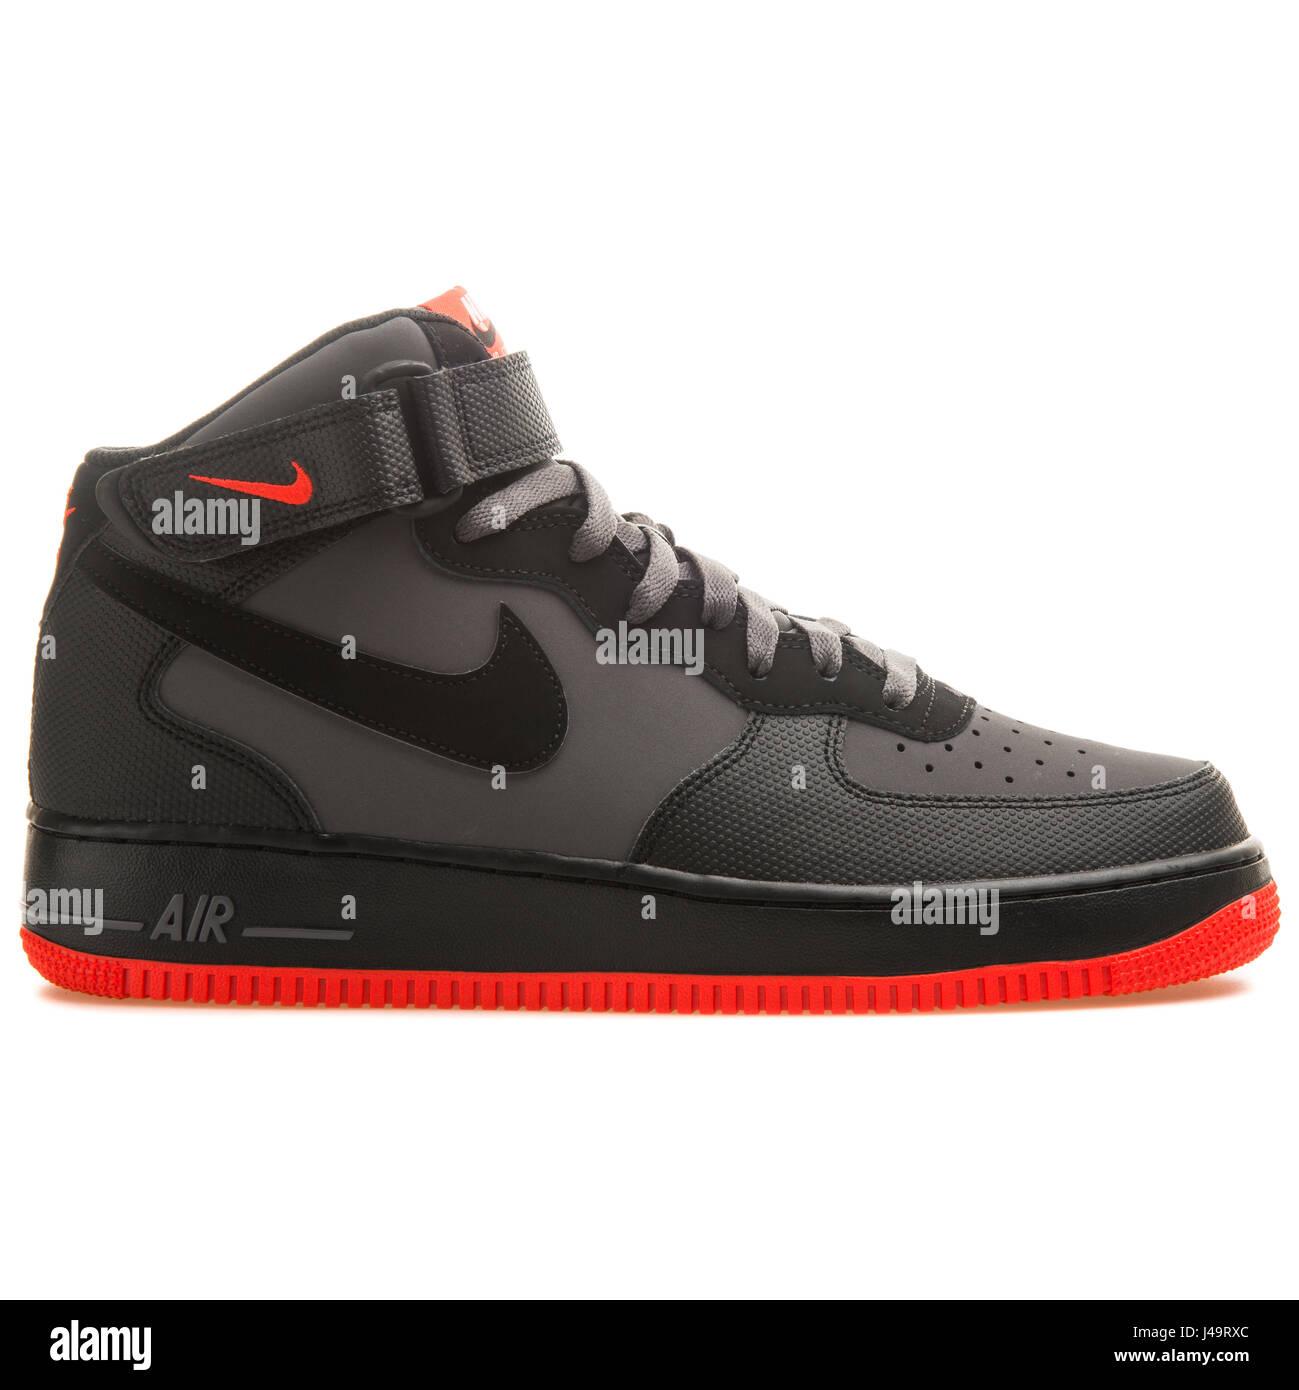 Force 031 Nike 1 Photo140357908 '07 Stock 315123 Air Mid Alamy SzUqMVp